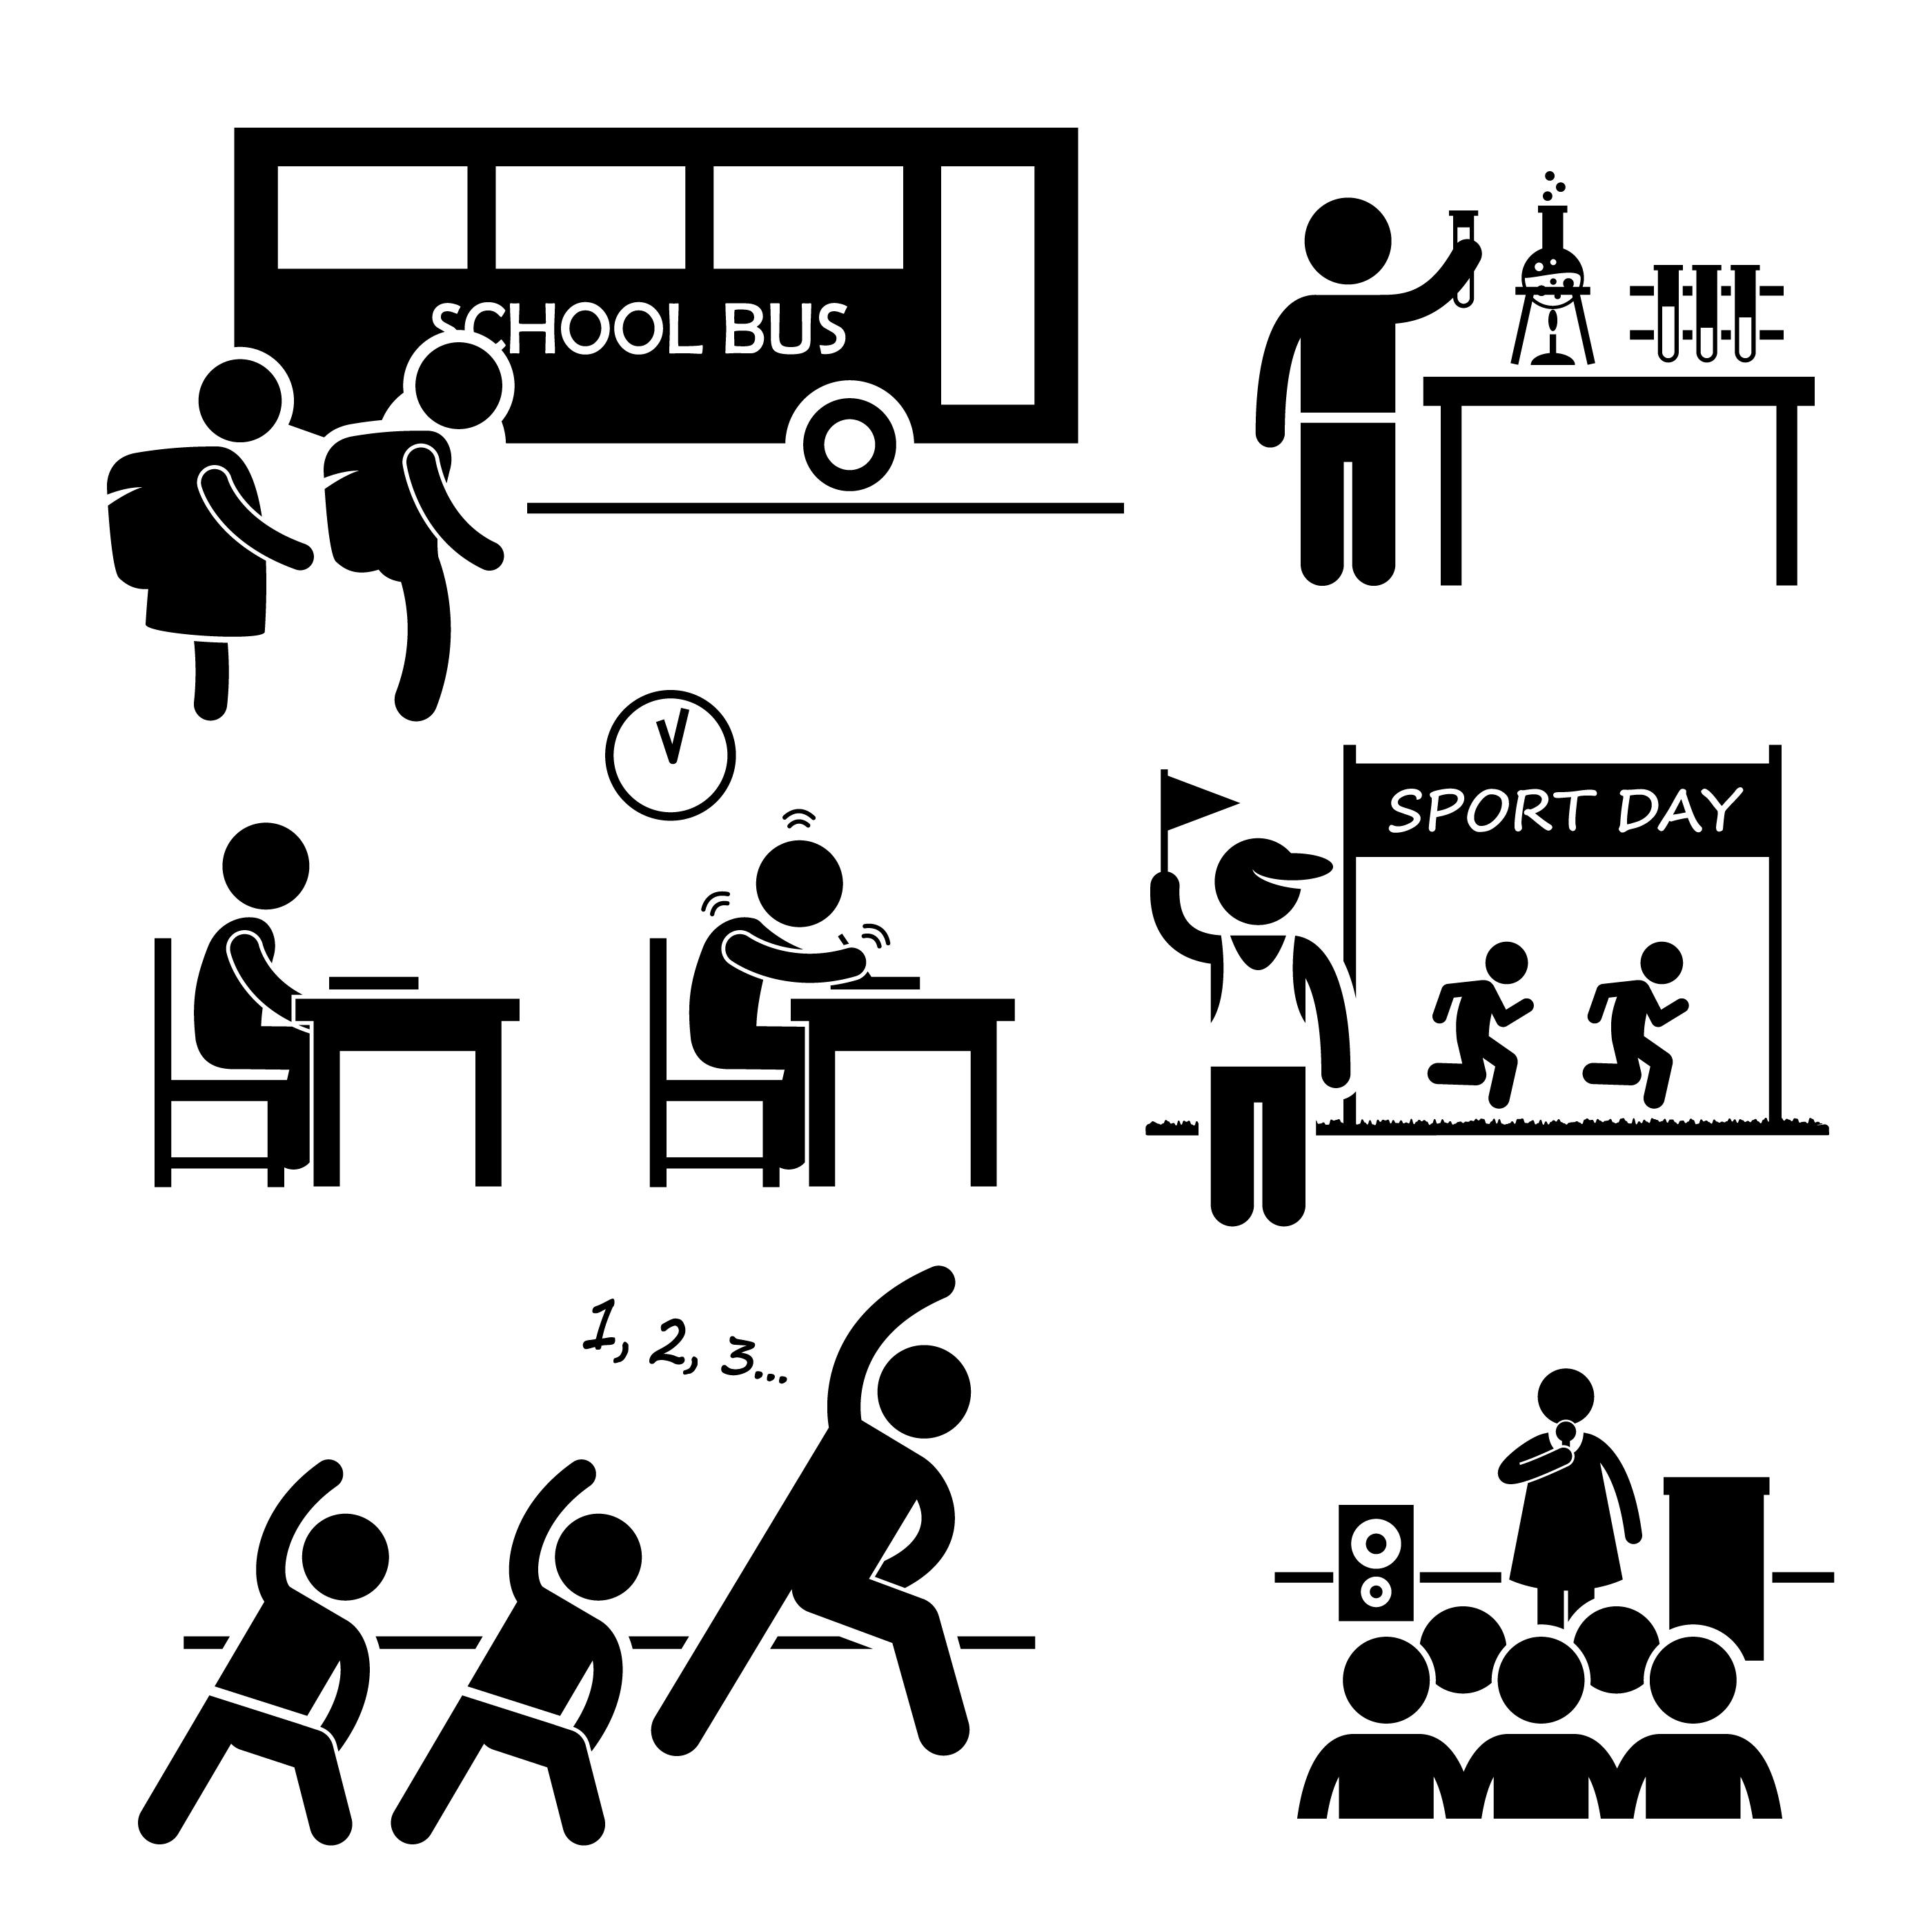 School Activity Event For Student Stick Figure Pictogram